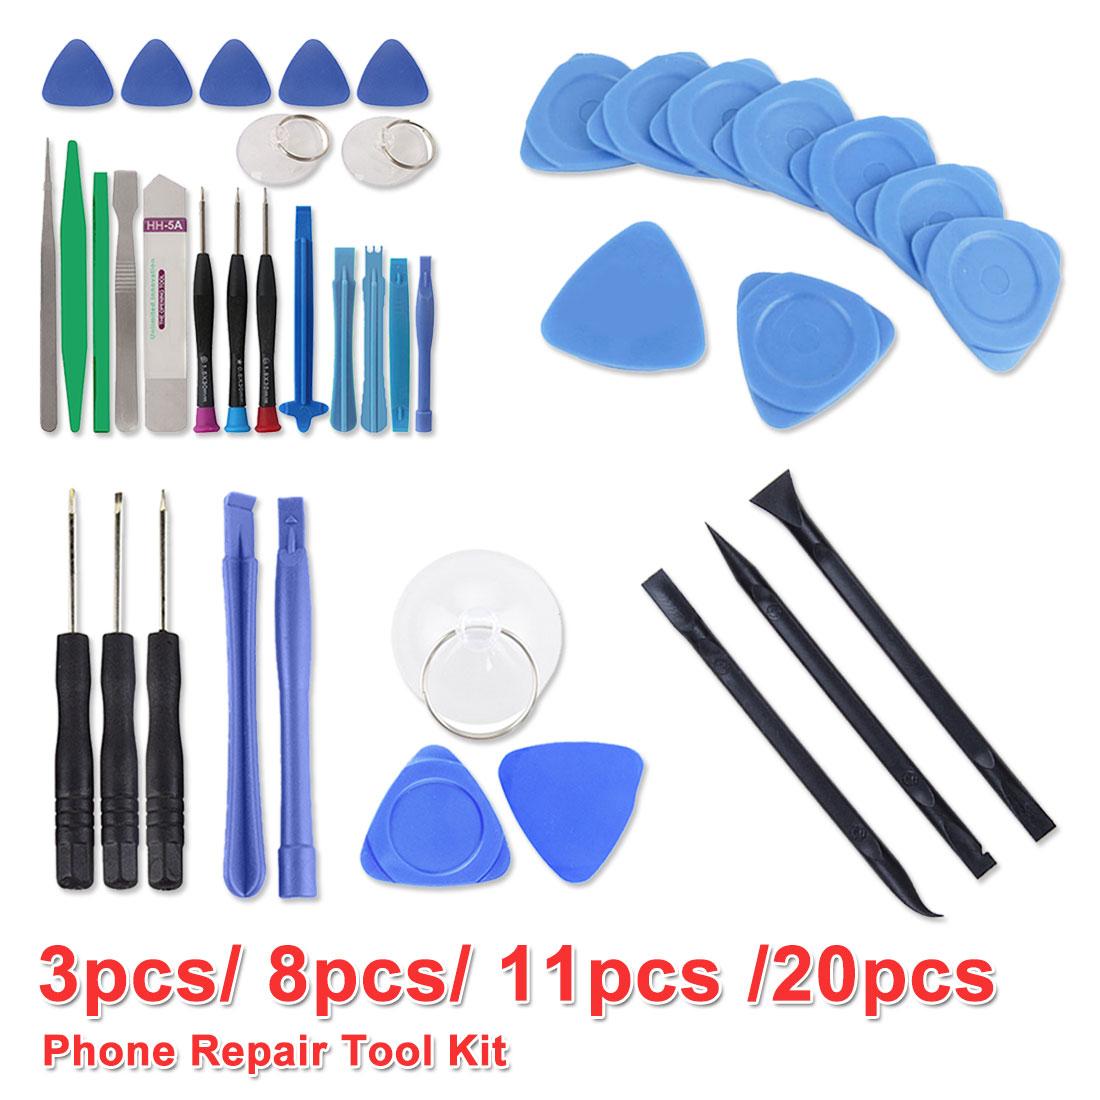 Hand Tools Set 8 In 1/11 In 1/20 In 1/3pcs Mobile Phone Repair Tools Kit Spudger Pry Opening Tool Screwdriver Set For Phone